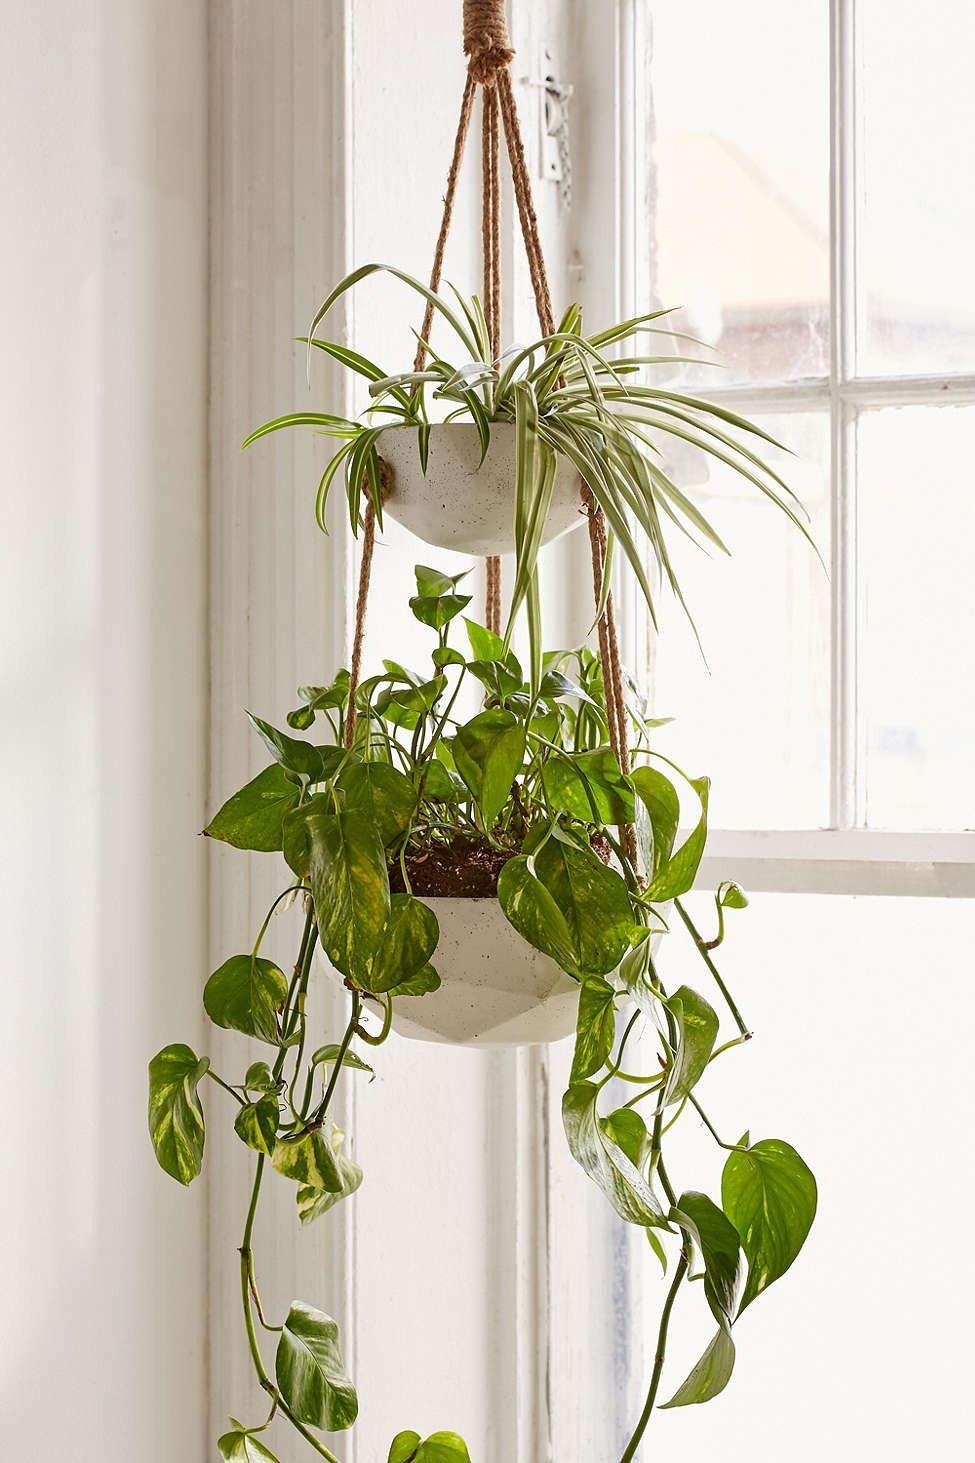 Ellis Double Hanging Planter | Planters, Urban and Indoor